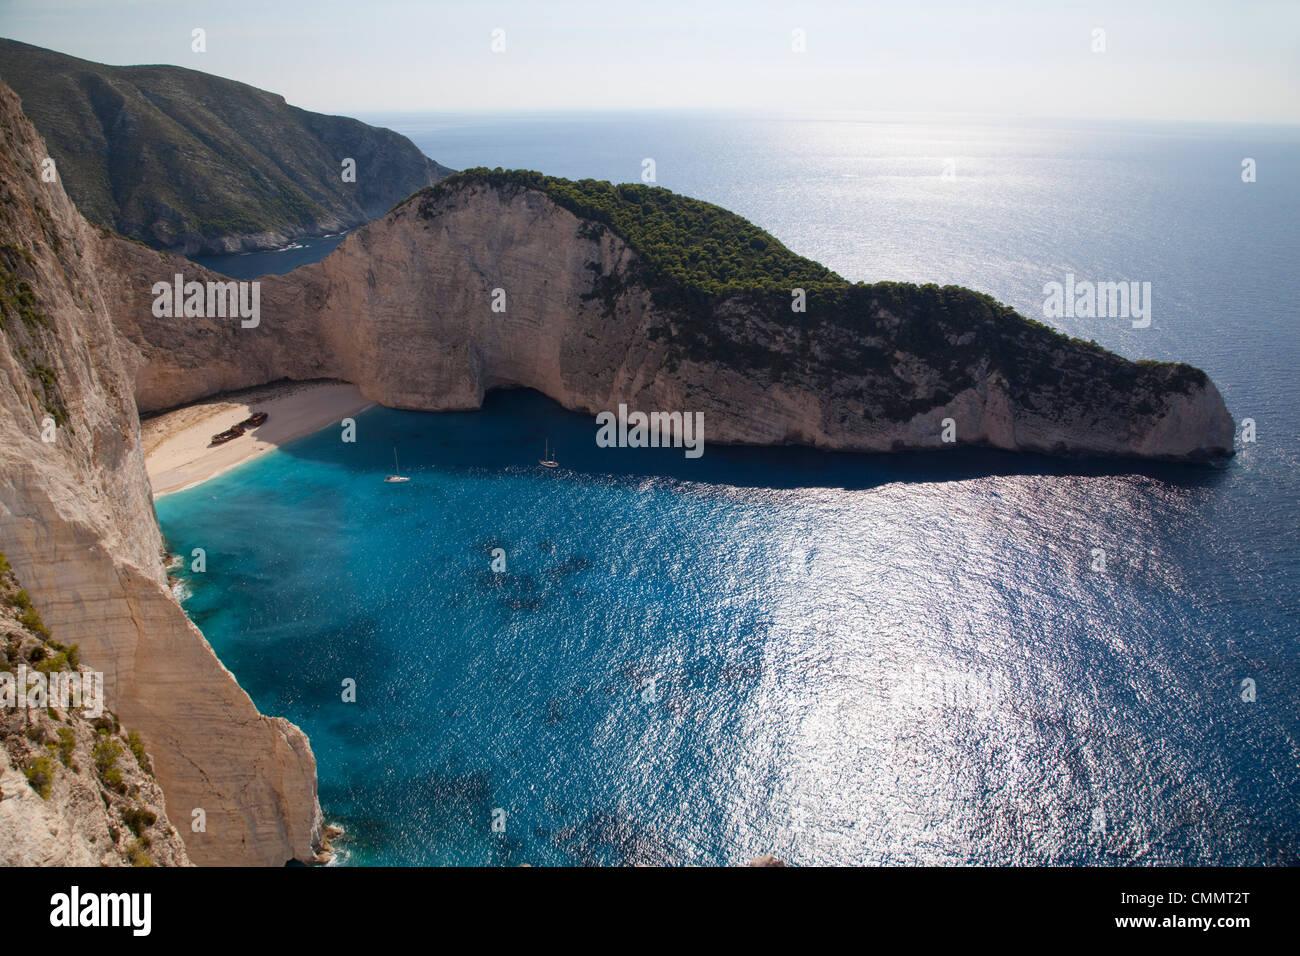 Shipwreck Bay, Zakynthos, Ionian Islands, Greek Islands, Greece, Europe - Stock Image